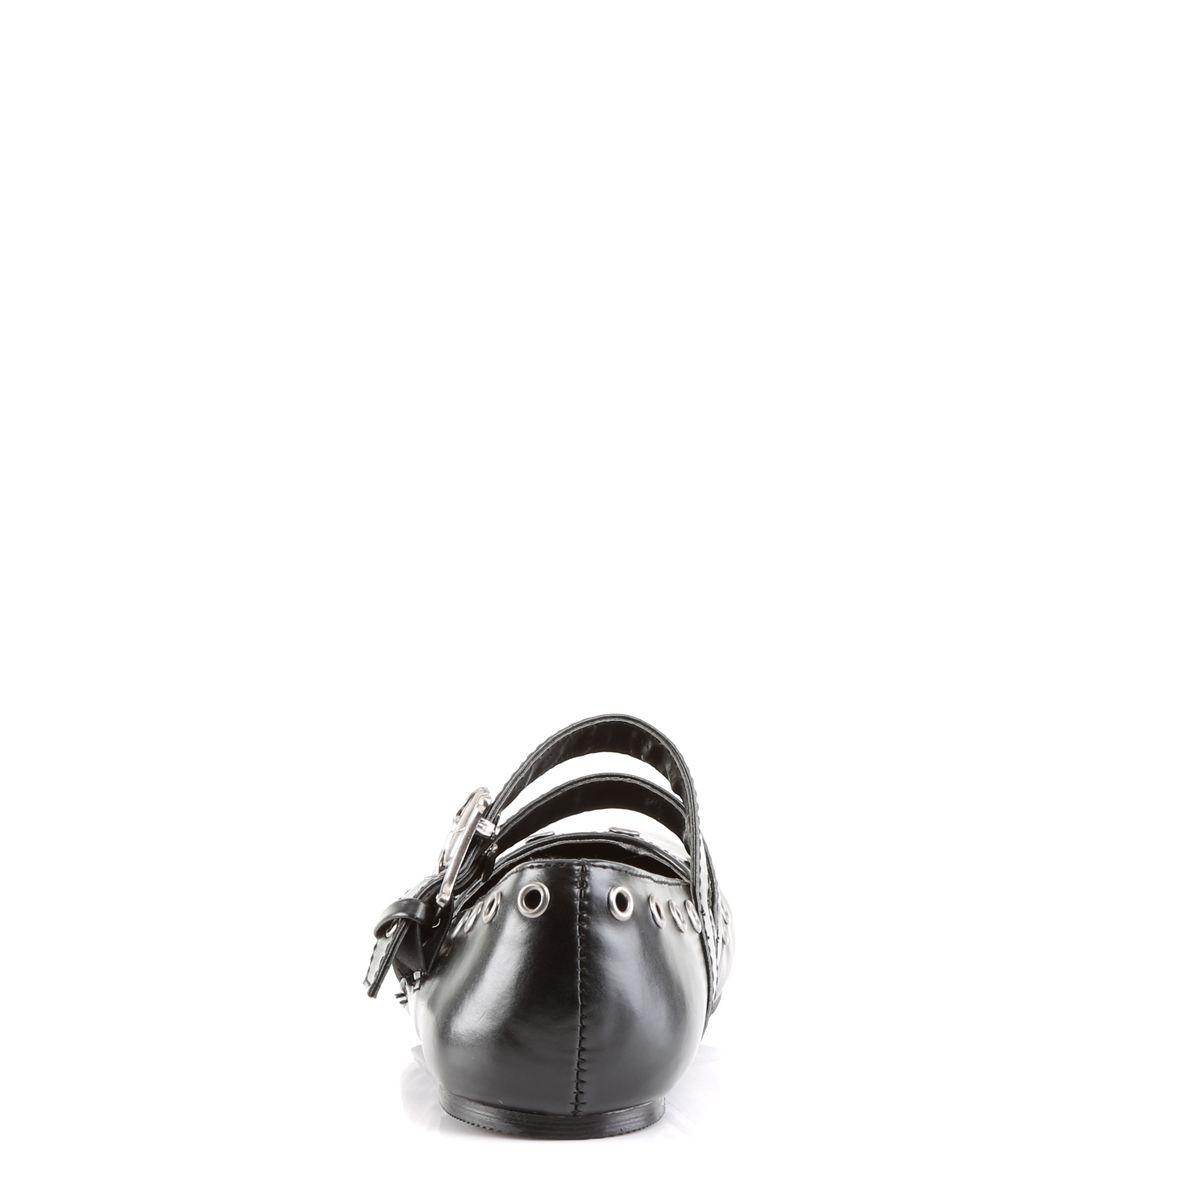 Sapato Daisy 03 - Demonia (encomenda)